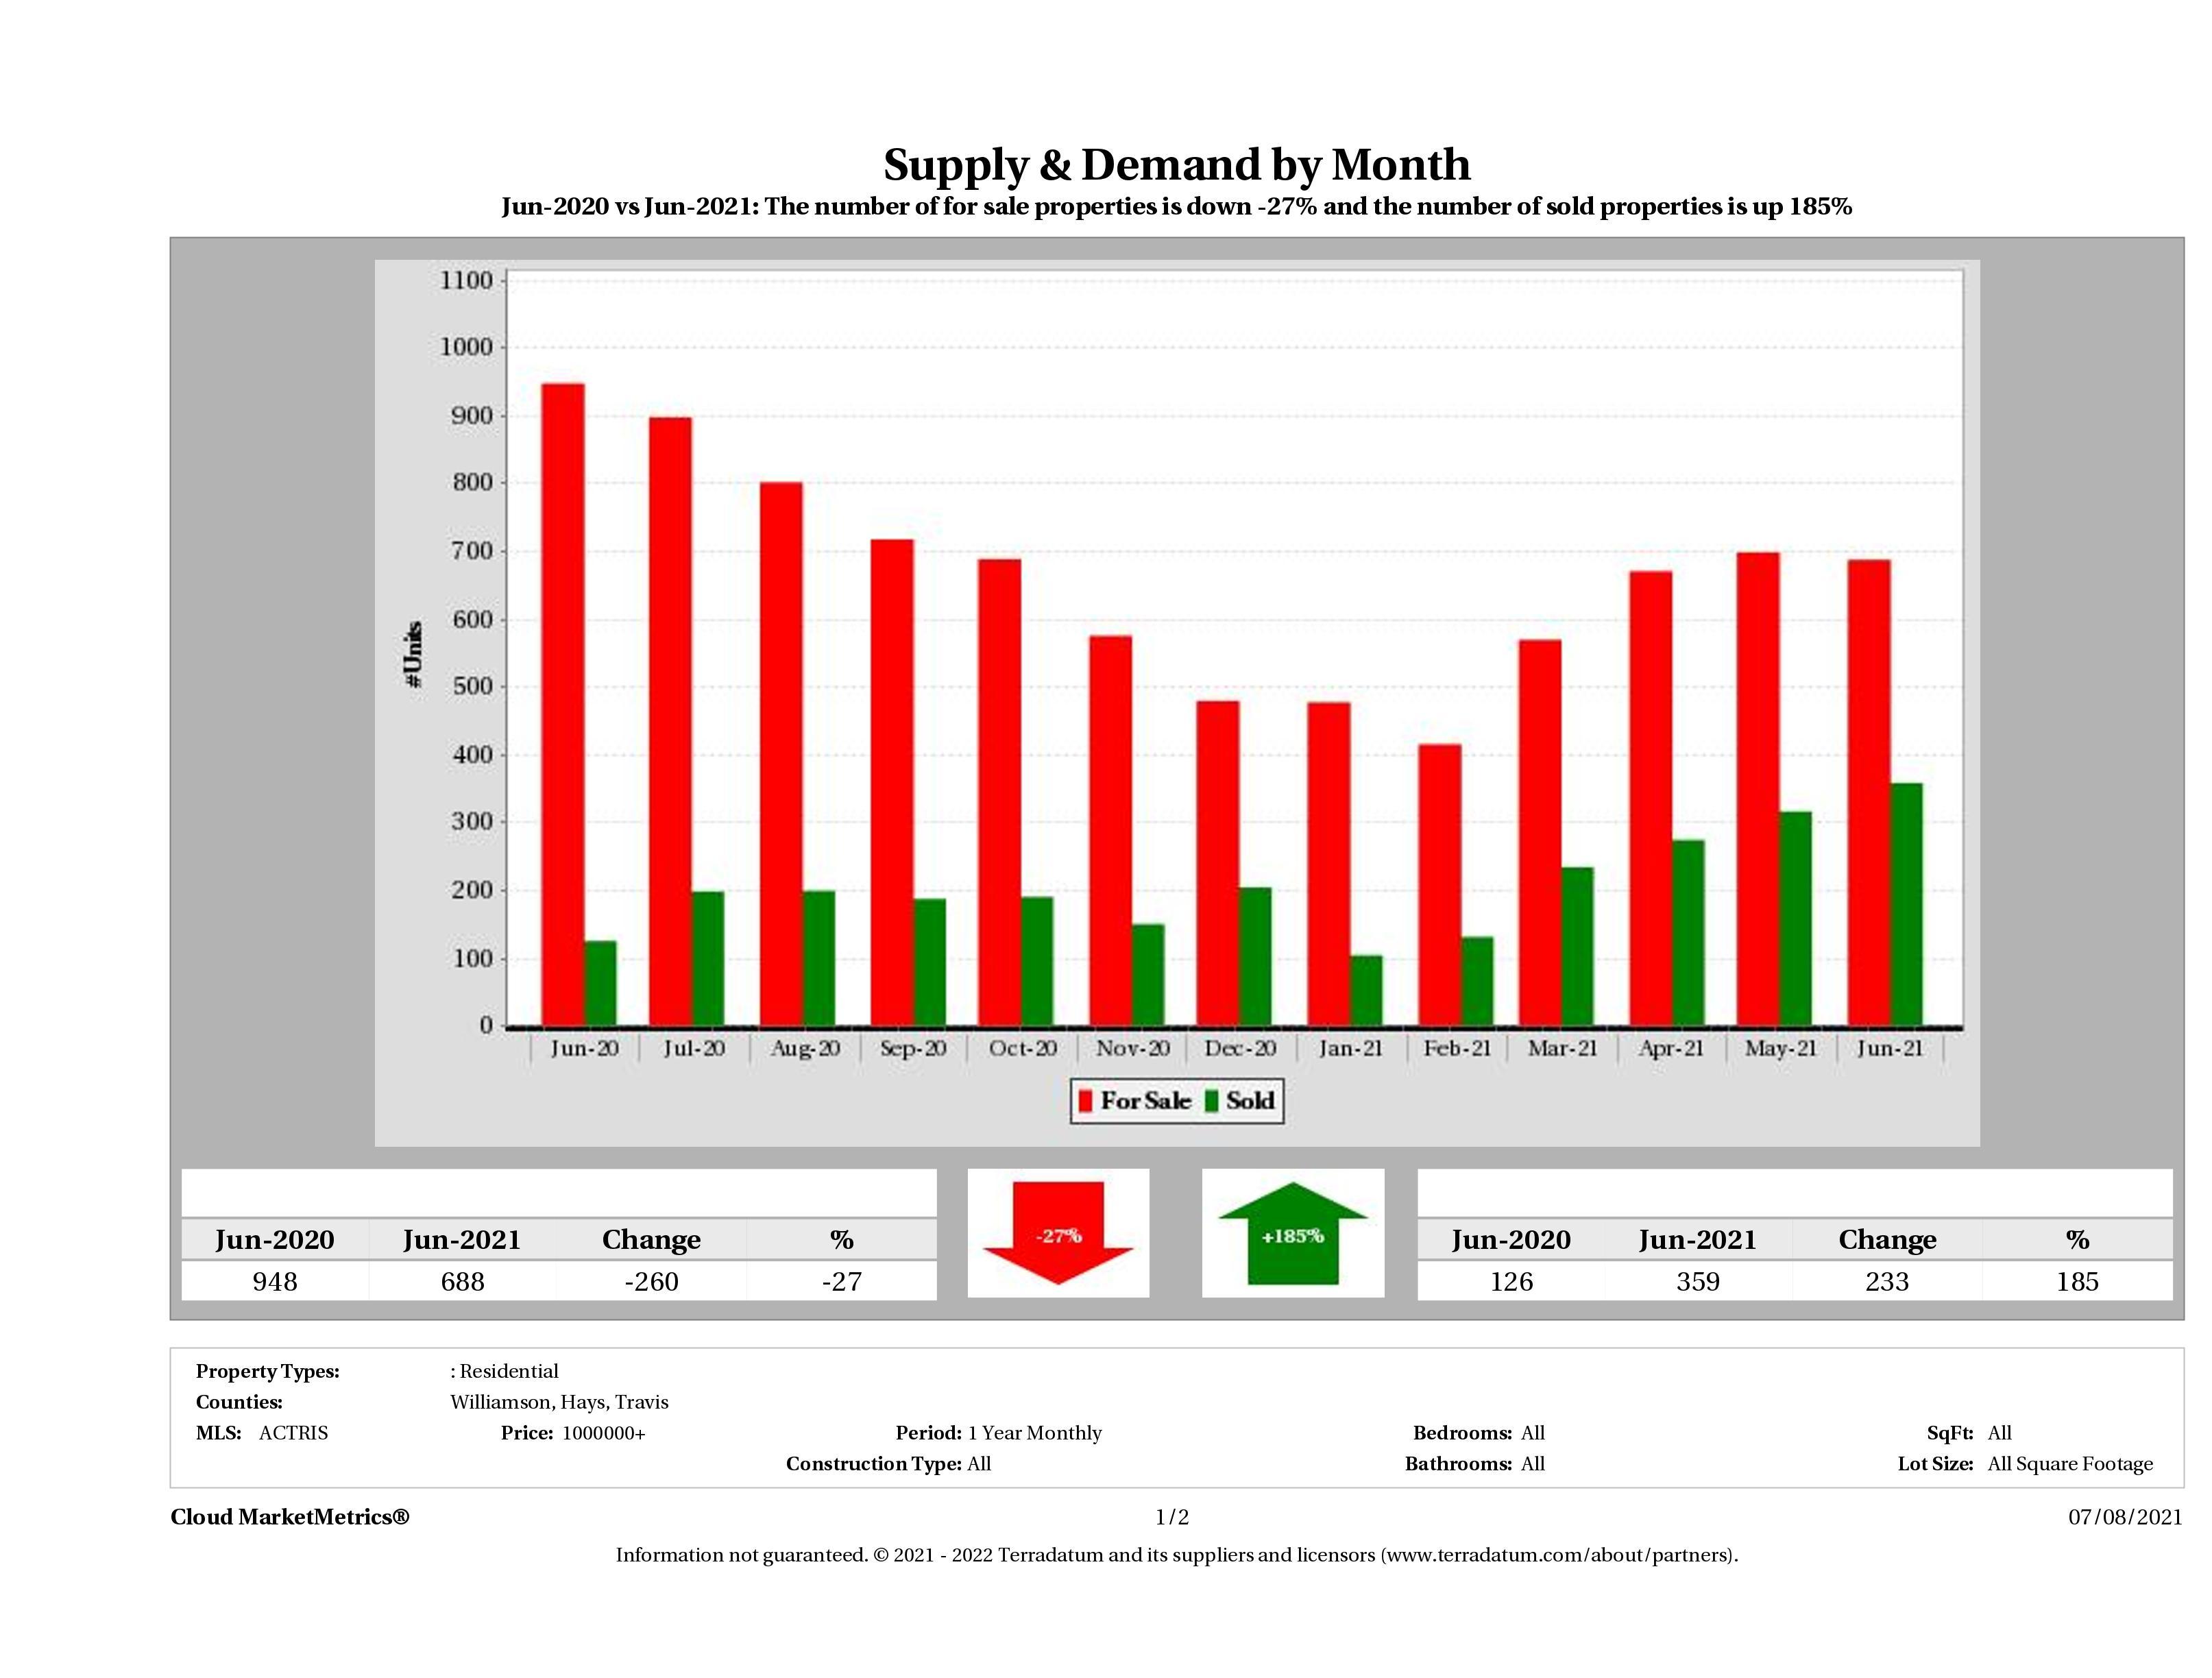 Austin luxury real estate market supply and demand June 2021